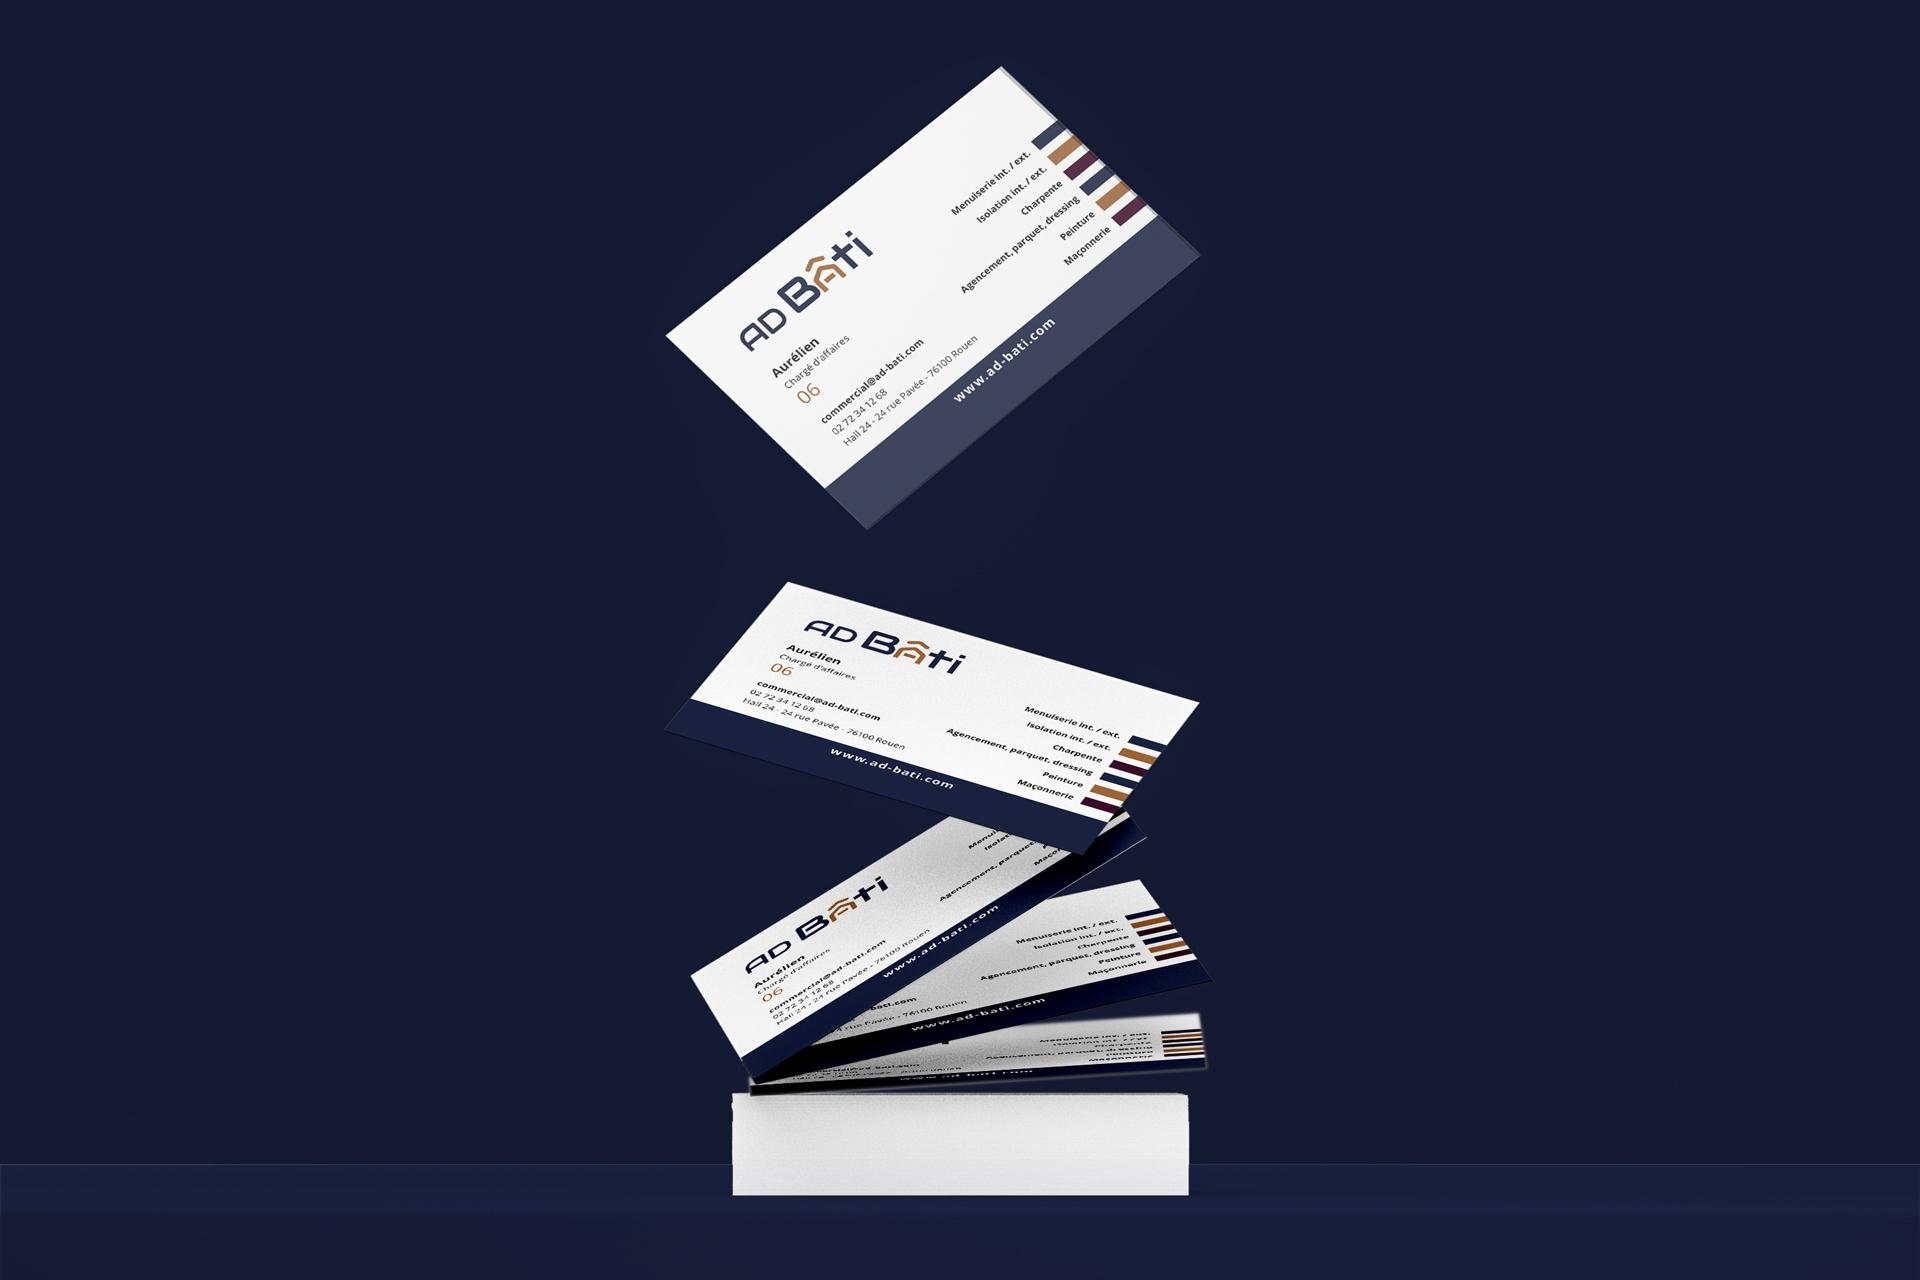 mockup carte de visite ad bati rouen client i-media agence de communication digitale